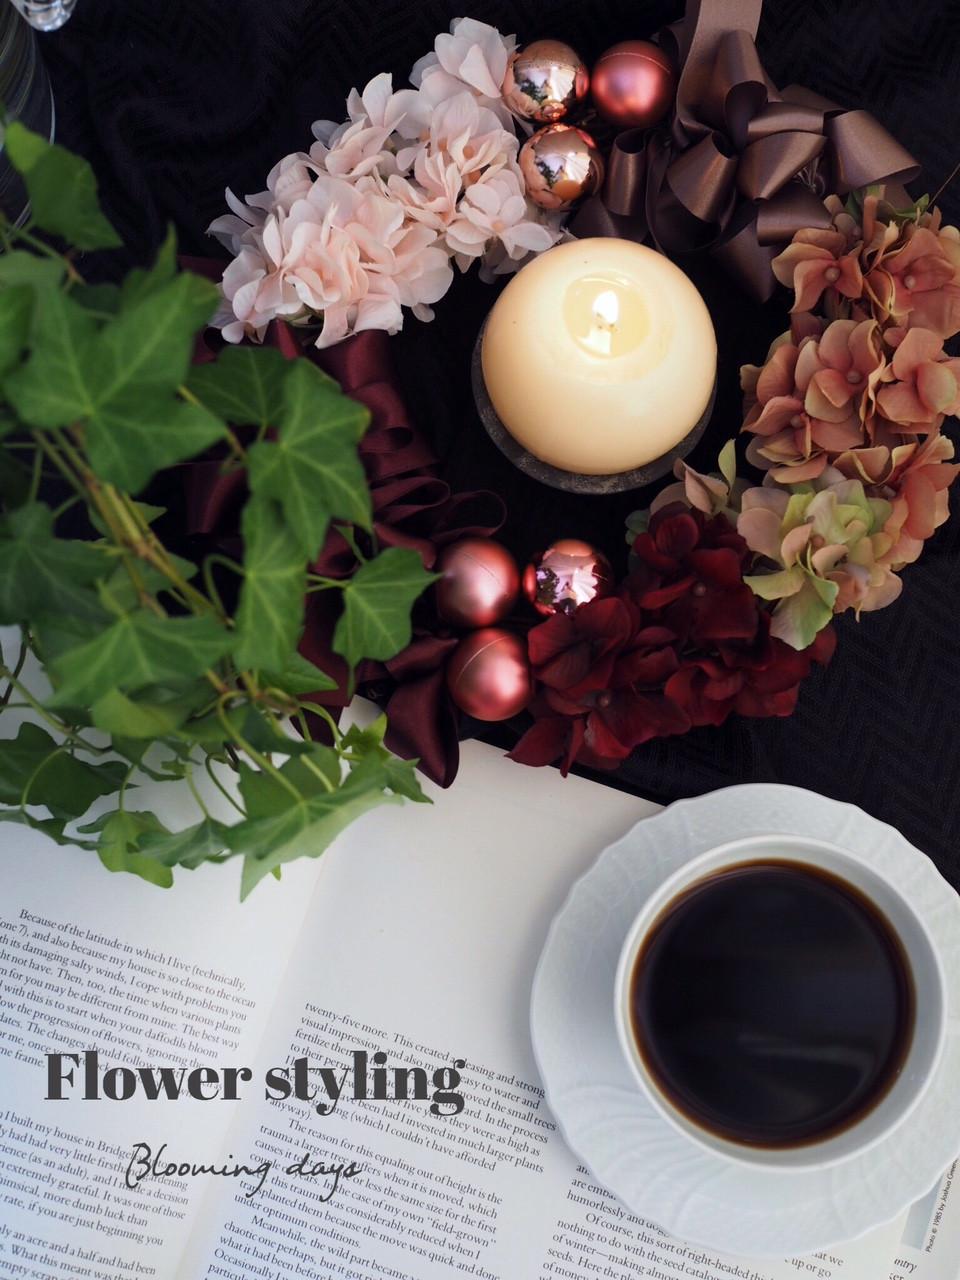 Flower styling 花のある暮し 白露